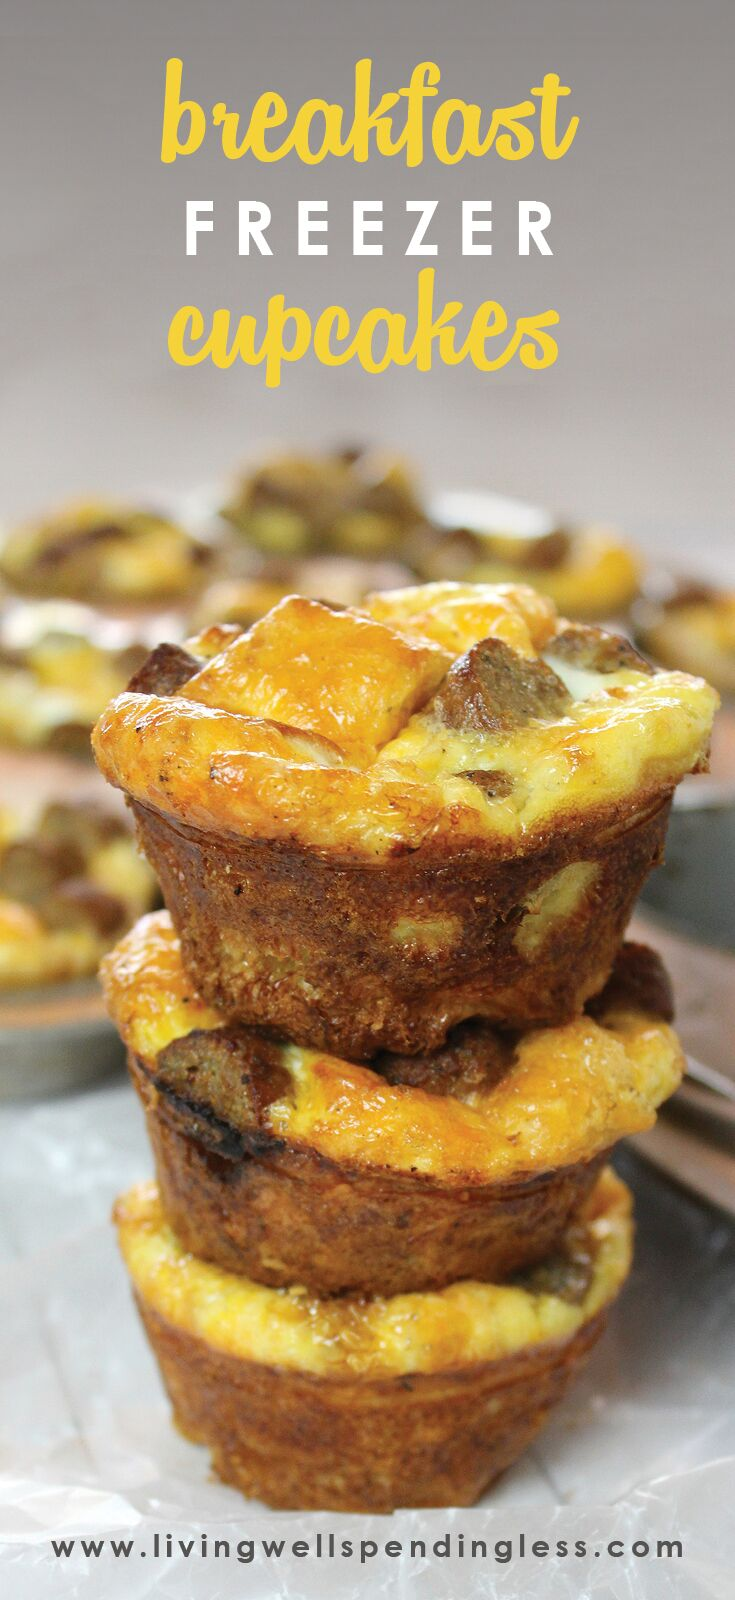 Freezer Breakfast Cupcakes | Breakfast Cupcakes | Breakfast Cupcakes Ideas | Breakfast Cupcakes Recipe | Simple Breakfast Cupcakes | Easy Freezer Meals | Meal Planning | Easy Freezer Breakfast Cupcakes